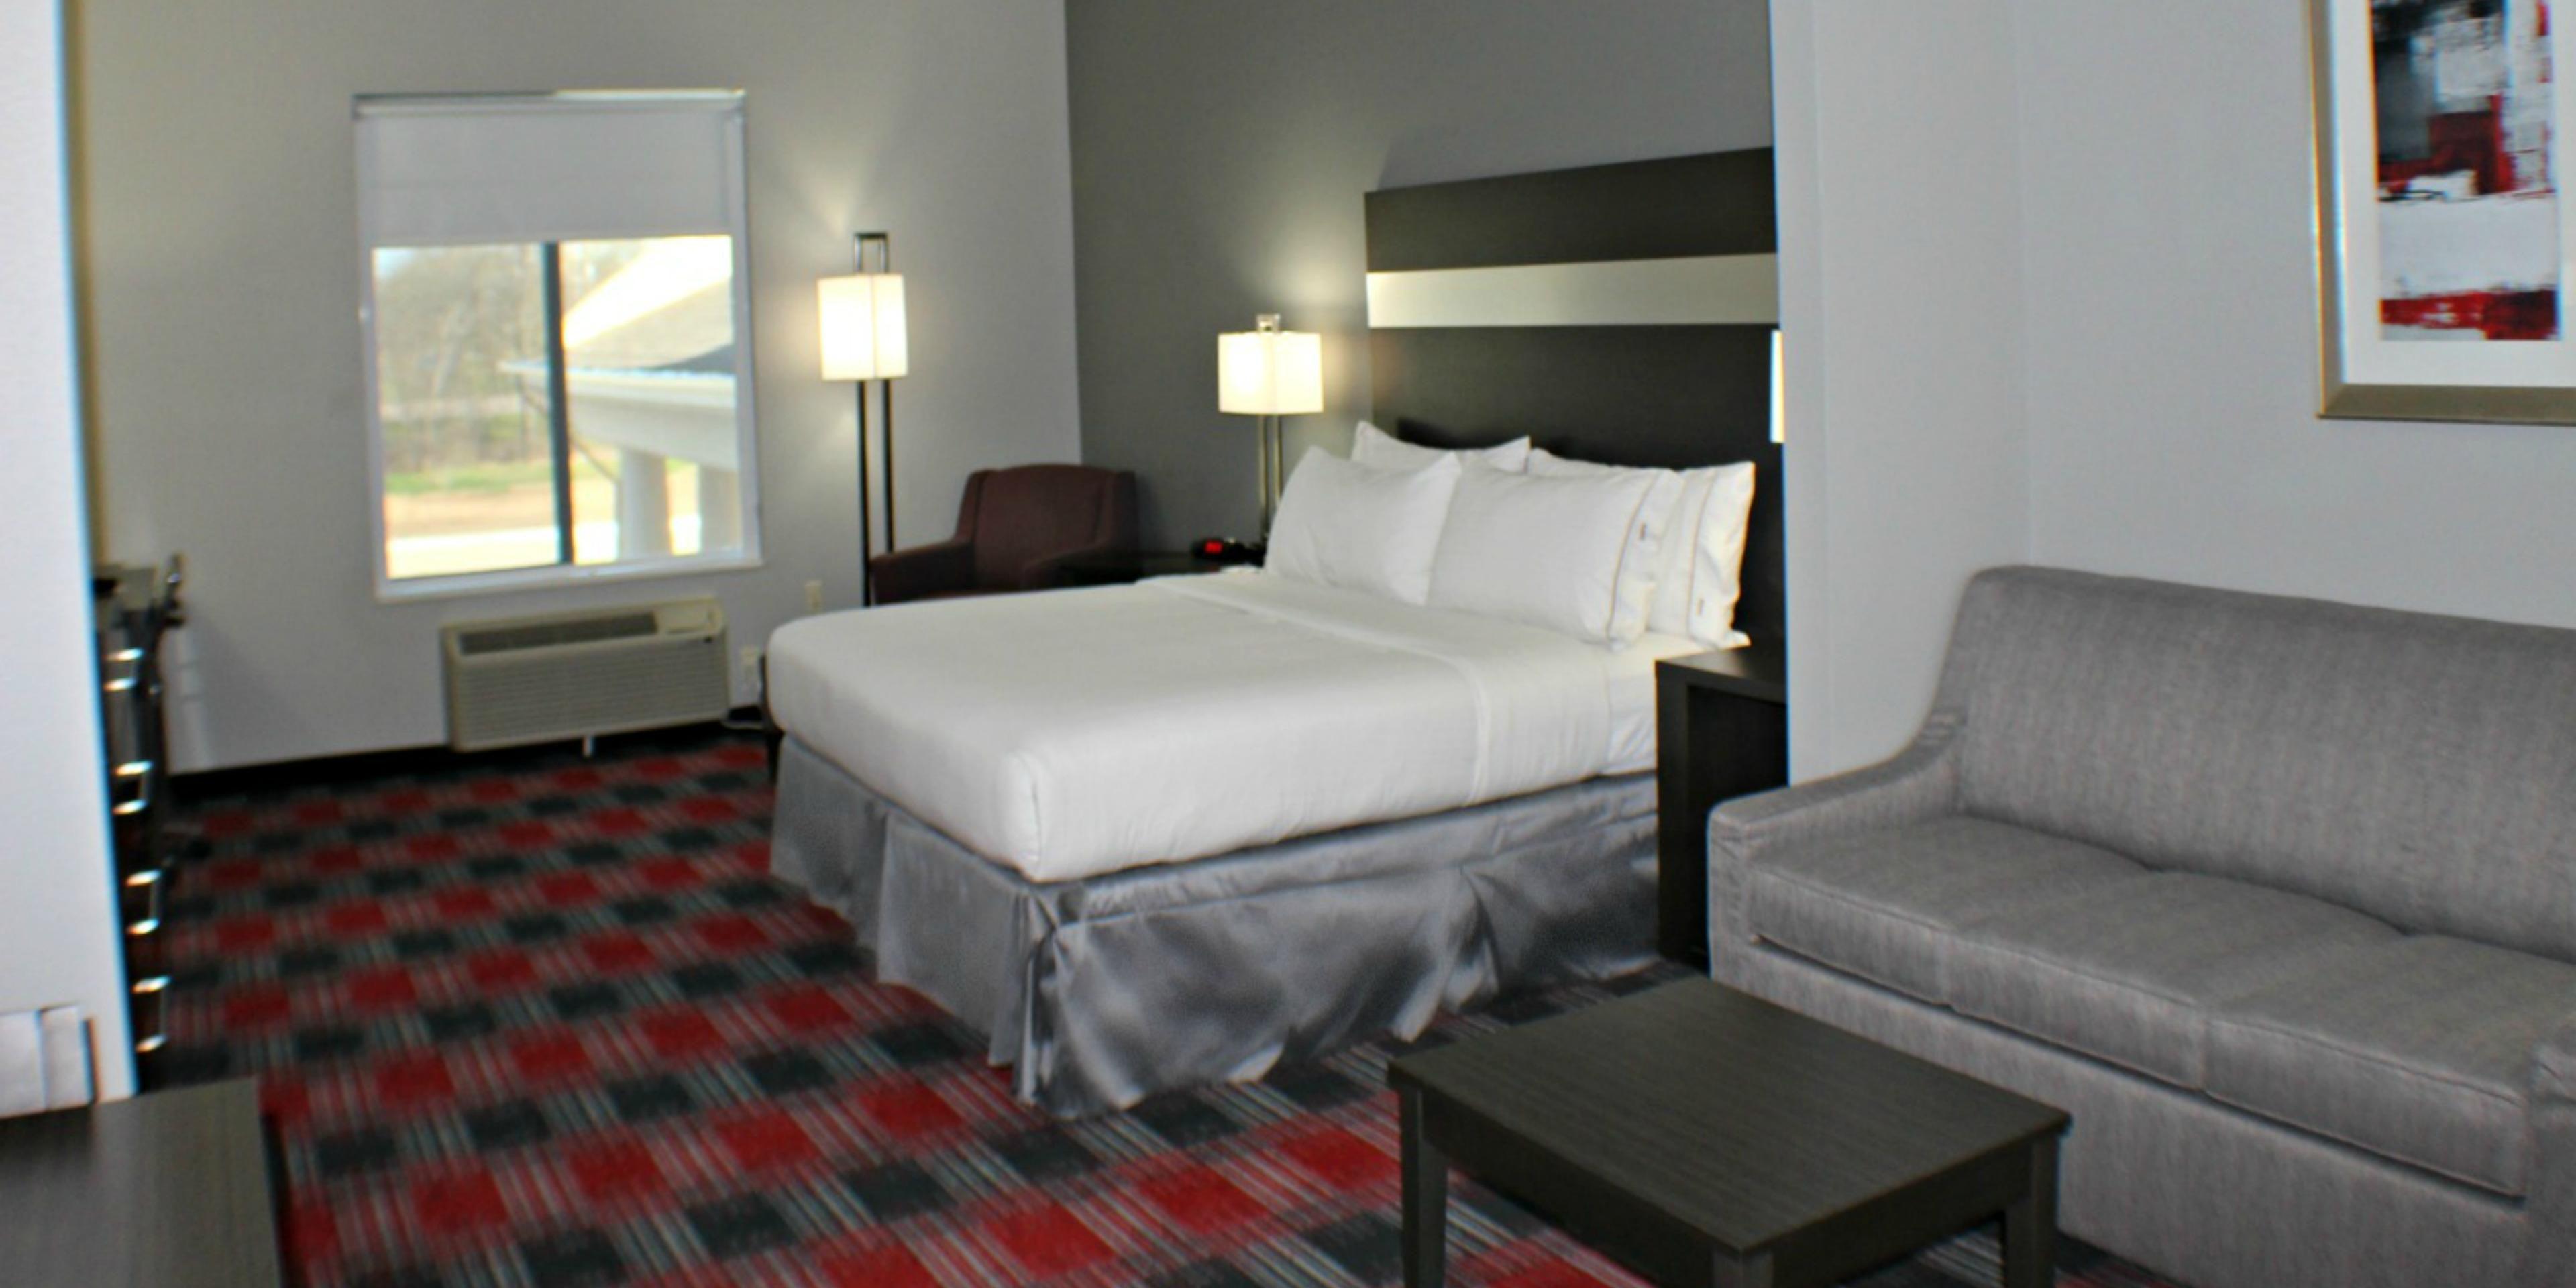 Holiday Inn Express And Suites Bonham 4367255416 2x1